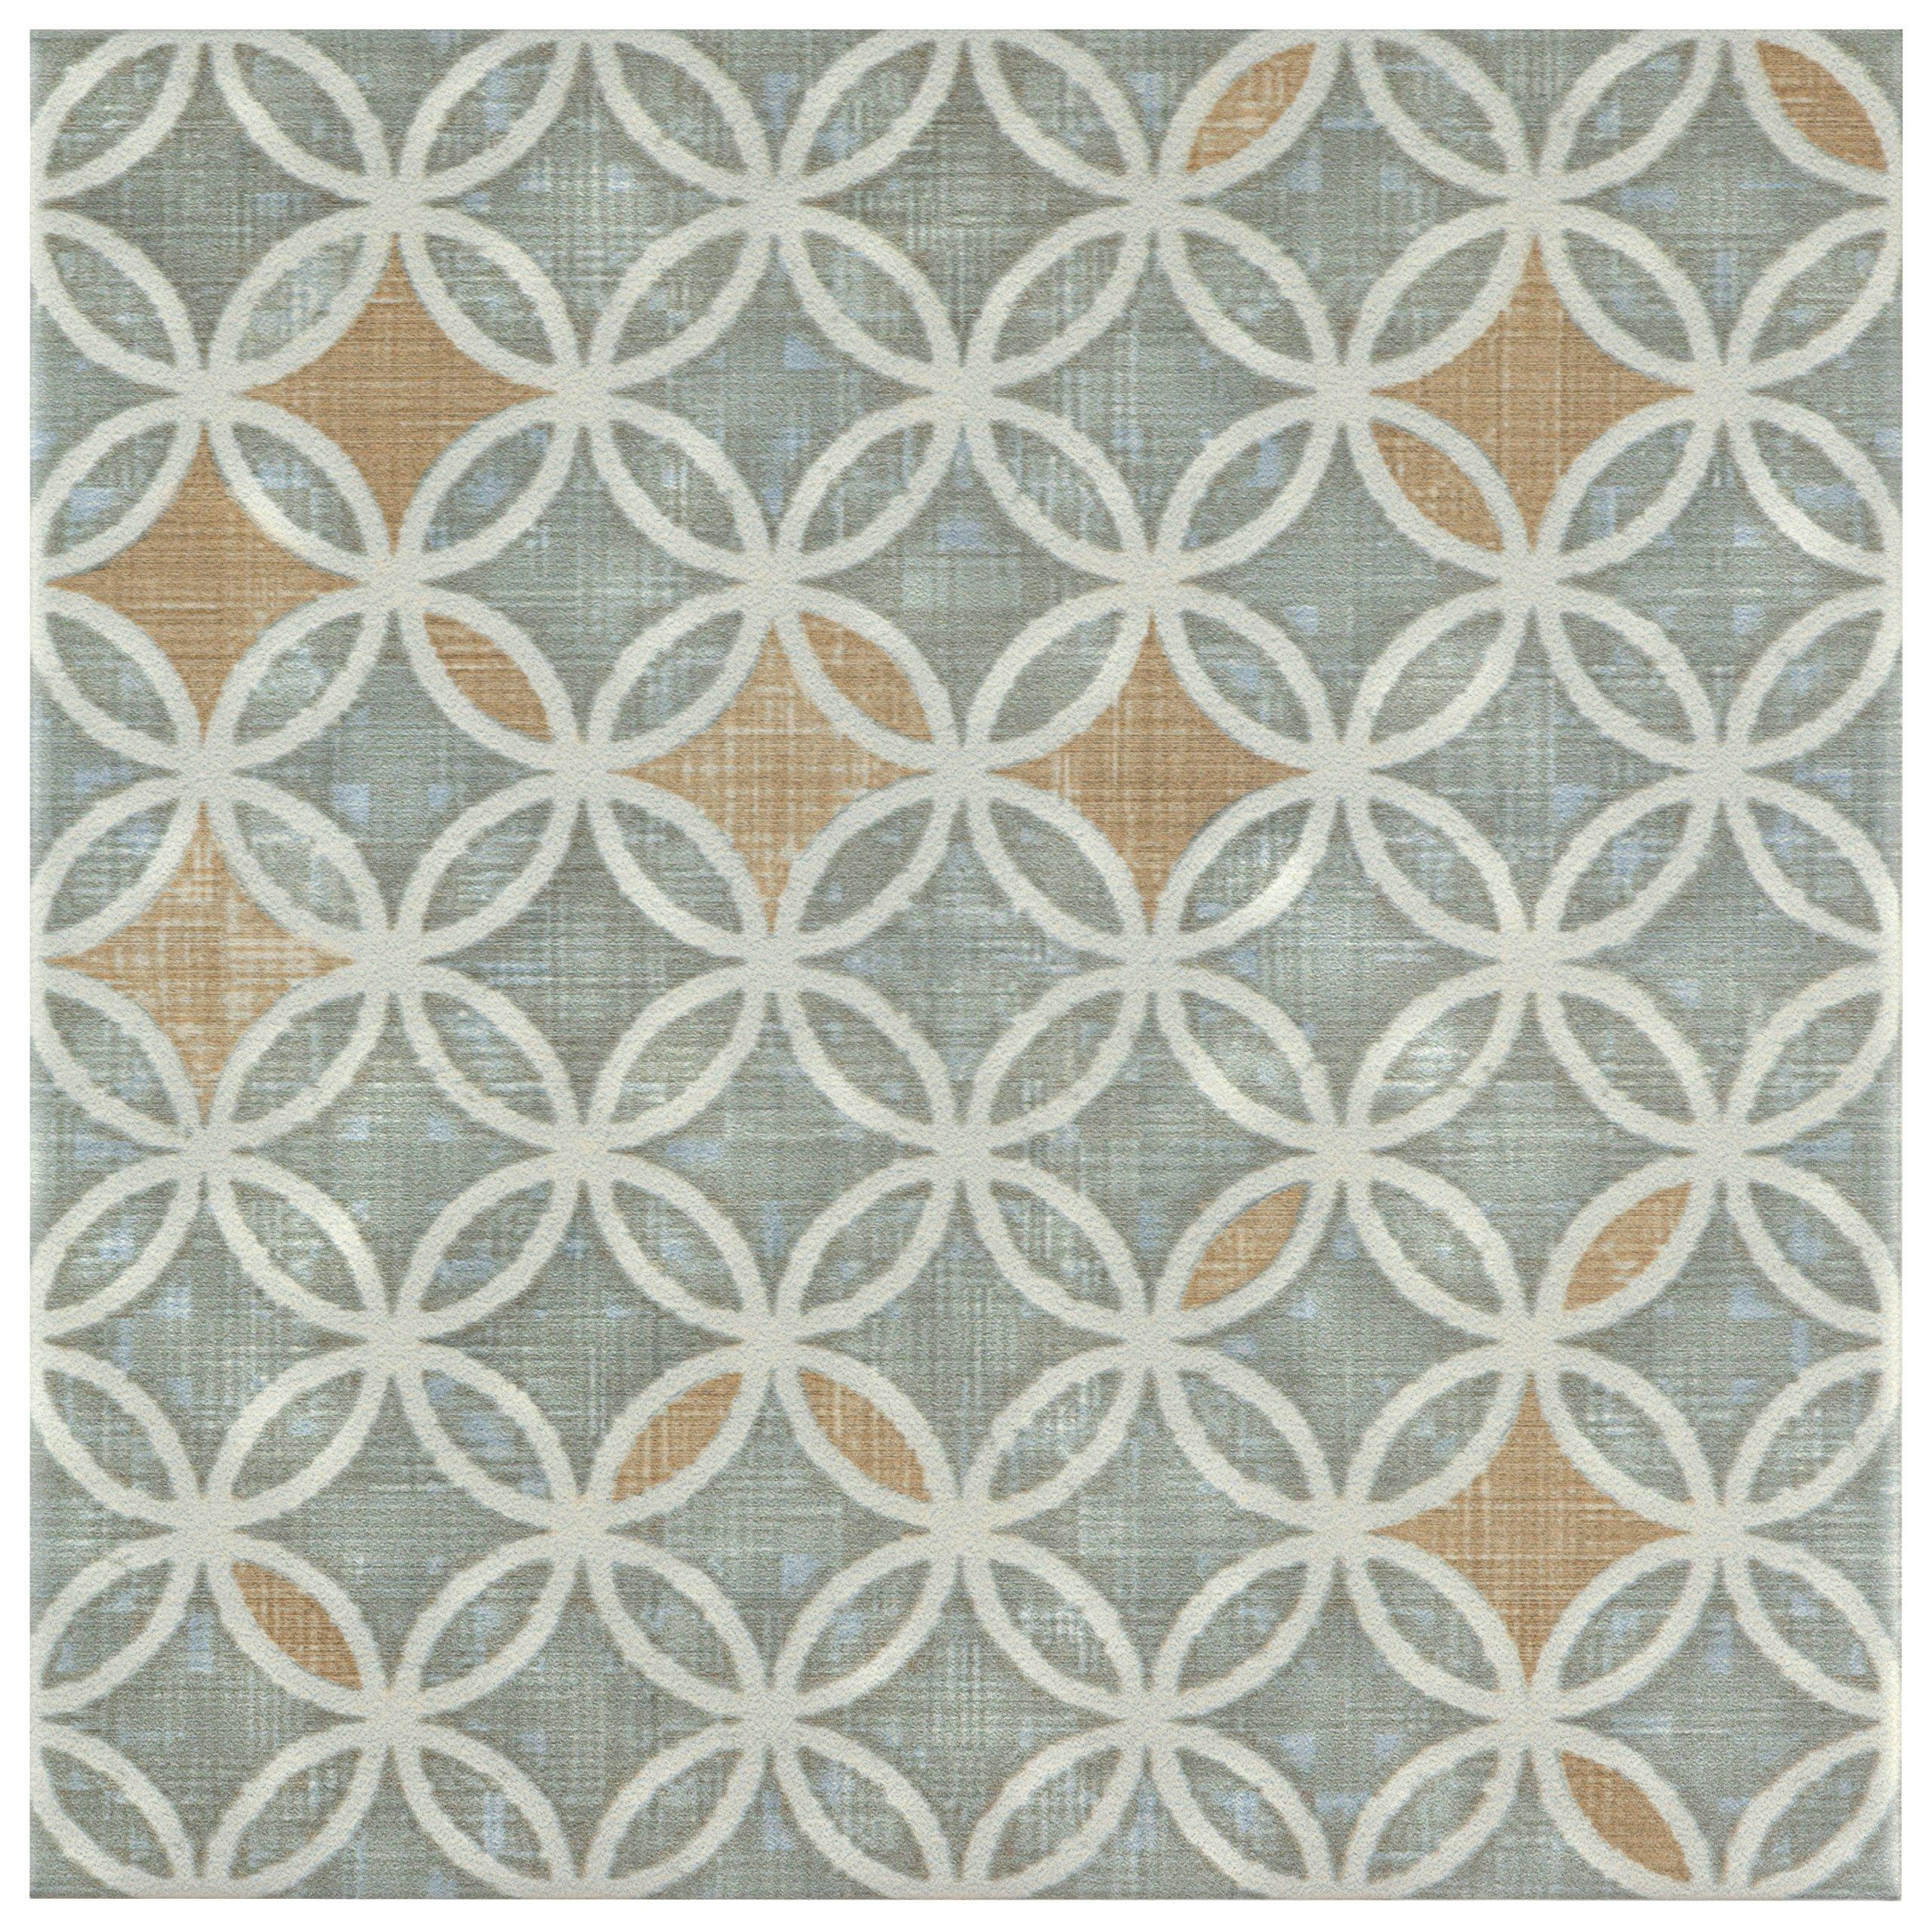 SomerTile FRC8BOHF Turin Ceramic Floor and Wall Tile, 7.75'' x 7.75'', Beige/Brown/Blue SomerTile FRC8BOHF Turin Ceramic Floor and Wall Tile, 7.75'' x 7.75'', Full, Beige/Brown/Blue